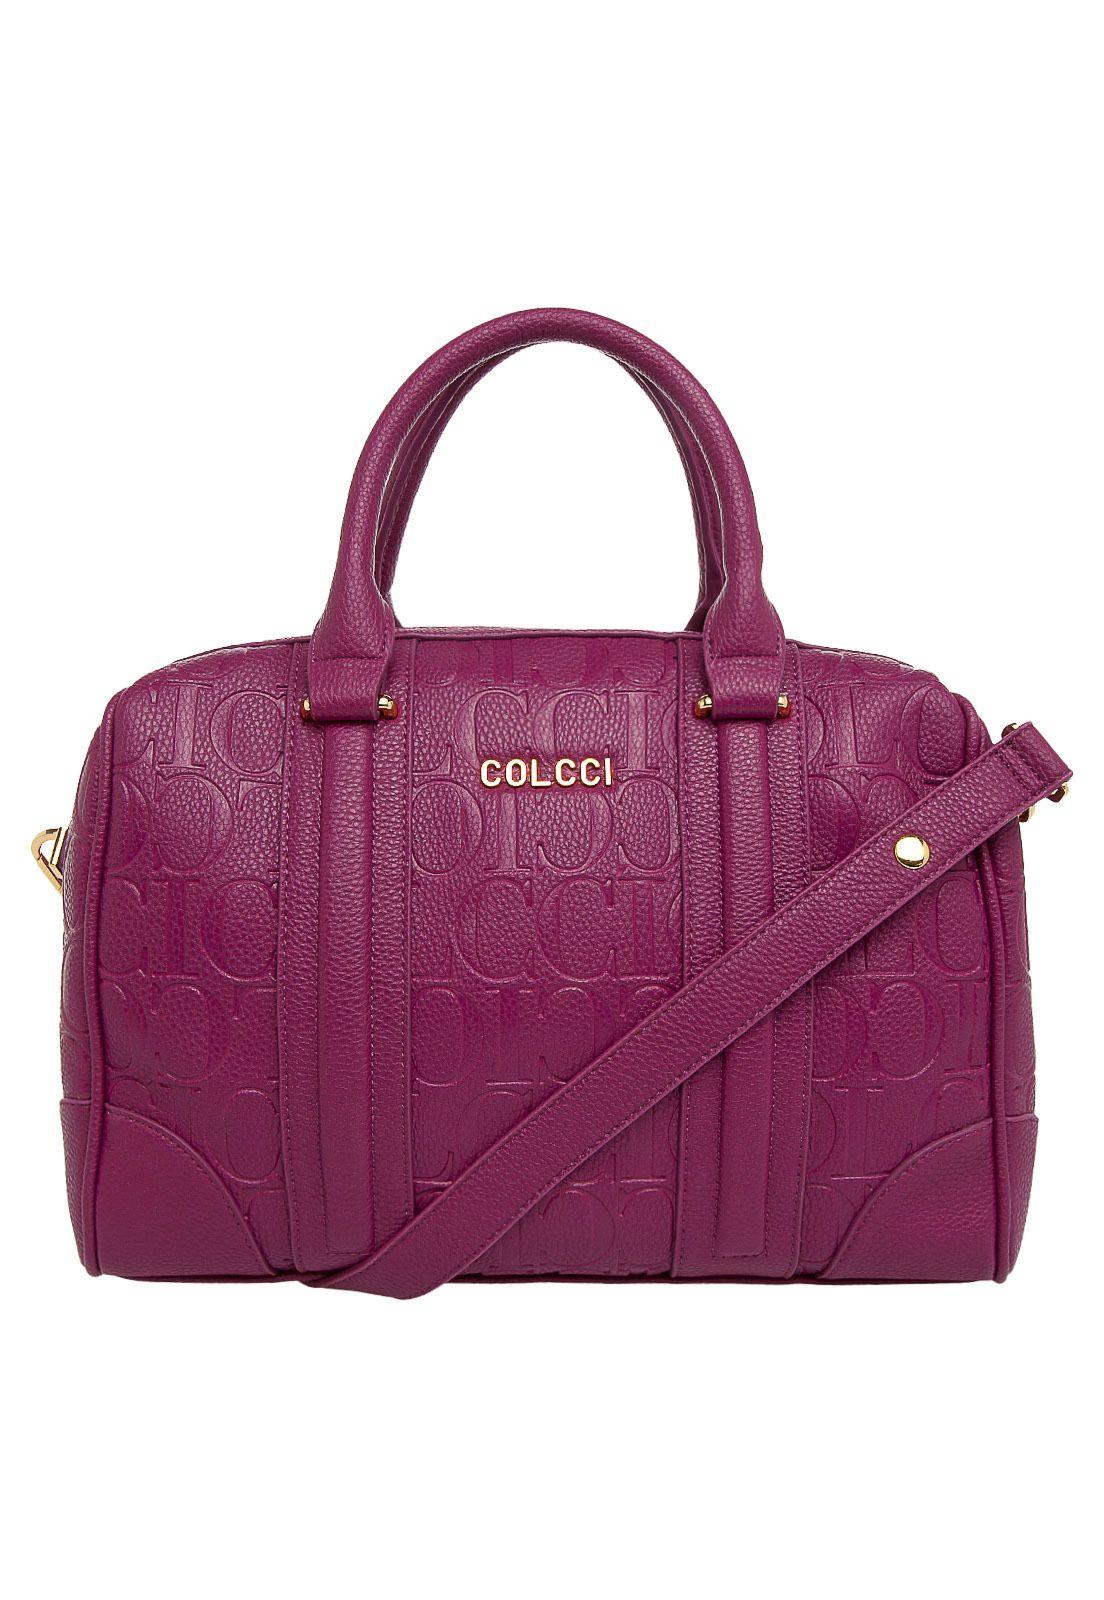 Bolsa Colcci Rosa - Compre Agora   Dafiti Brasil   Bags   Shoes ... 535824c8ca